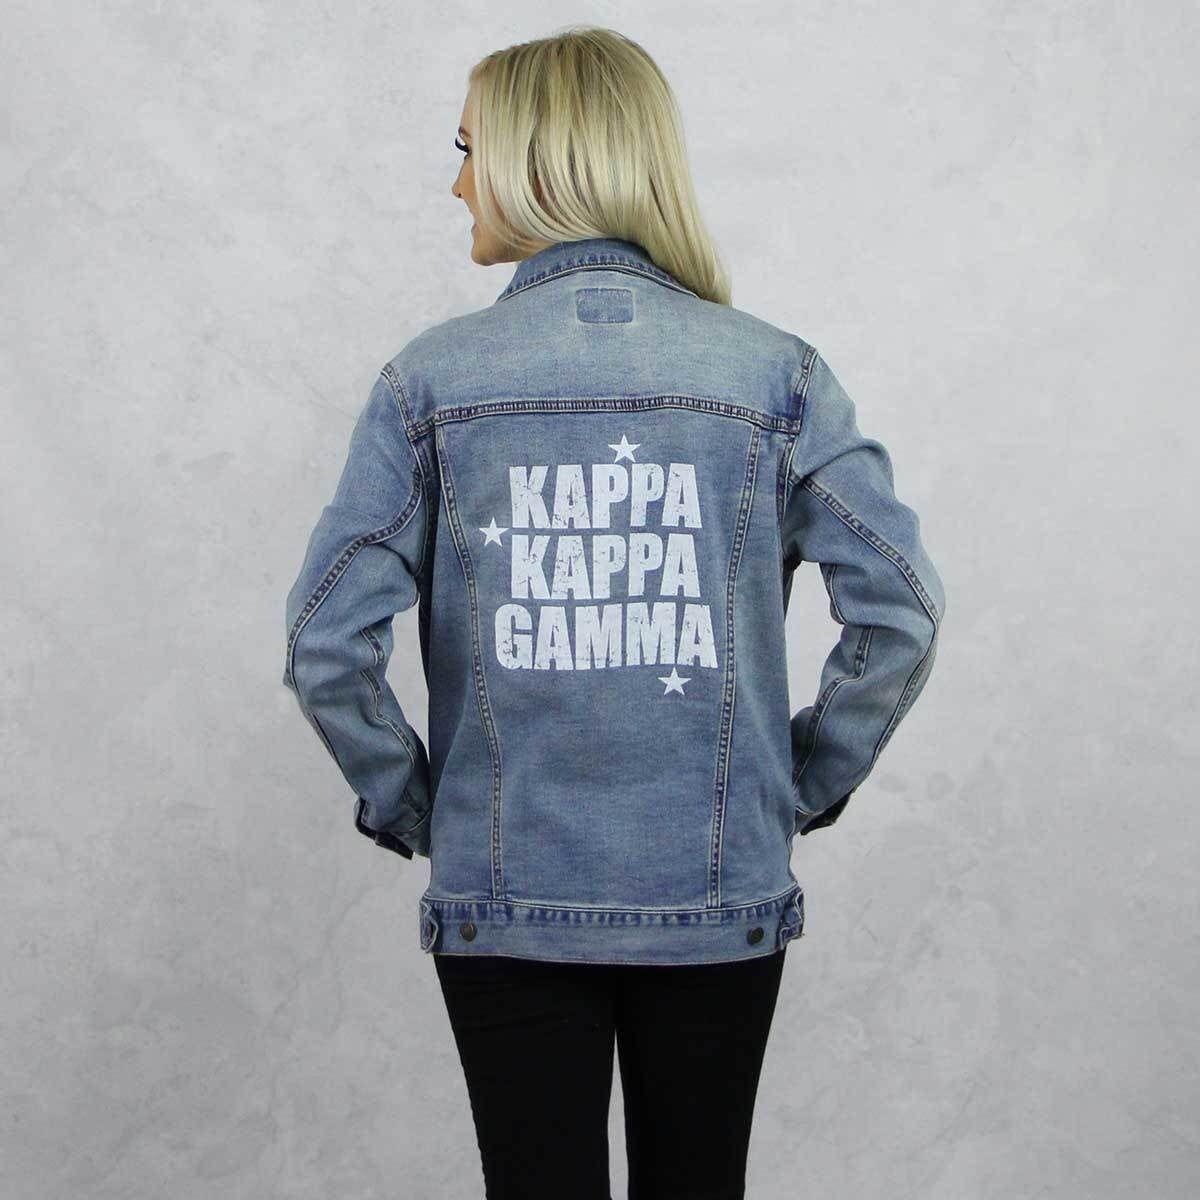 Kappa Kappa Gamma Jean Jacket By Sororityspecialties On Etsy Https Www Etsy Com Listing 711686396 Kappa Kap Diy Denim Jacket Long Sweatshirt Sorority Outfits [ 1200 x 1200 Pixel ]